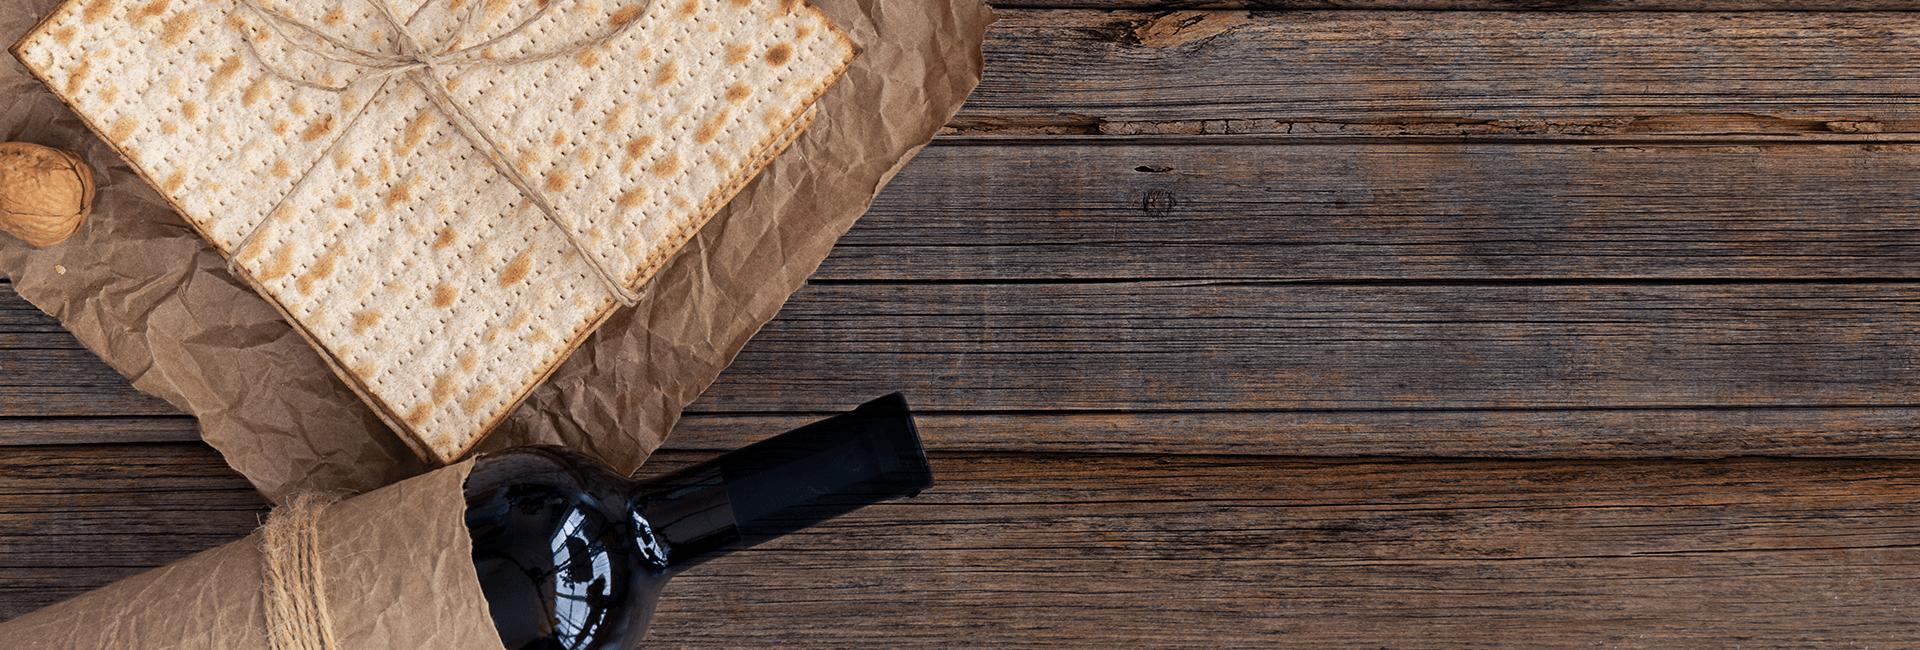 kosher wine gift baskets new york city